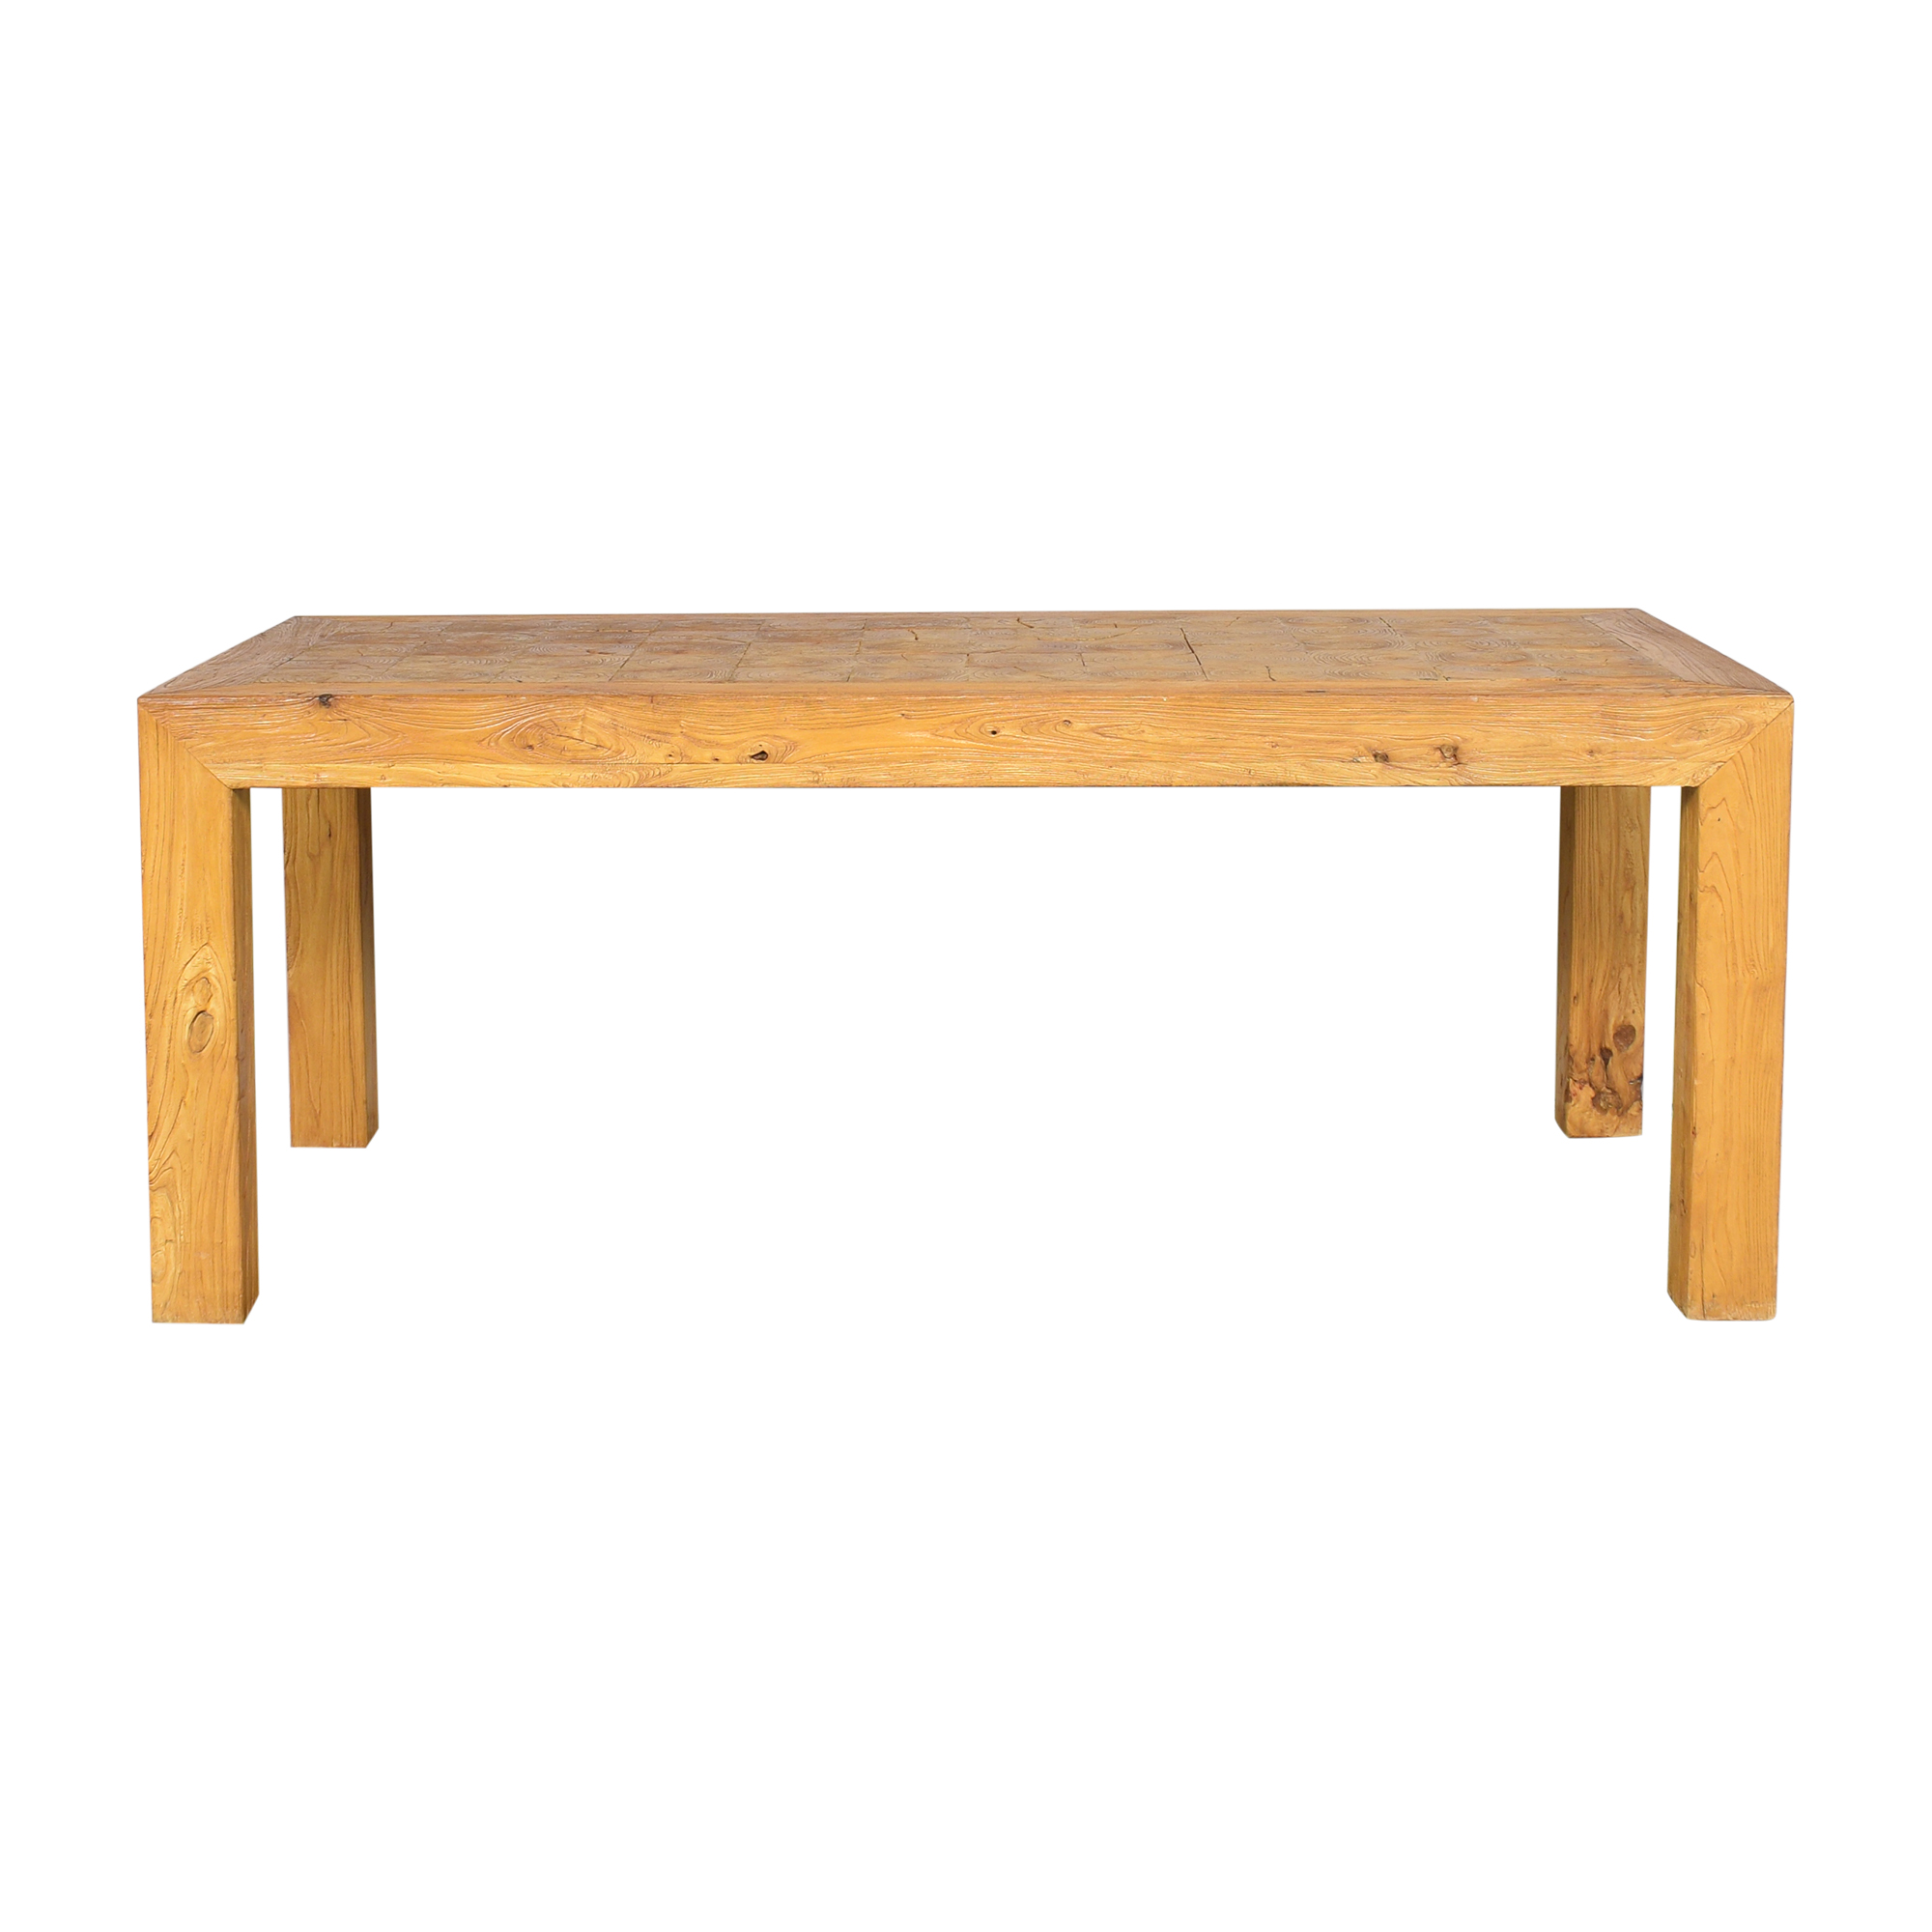 ABC Carpet & Home ABC Carpet & Home Rectangular Dining Table Tables